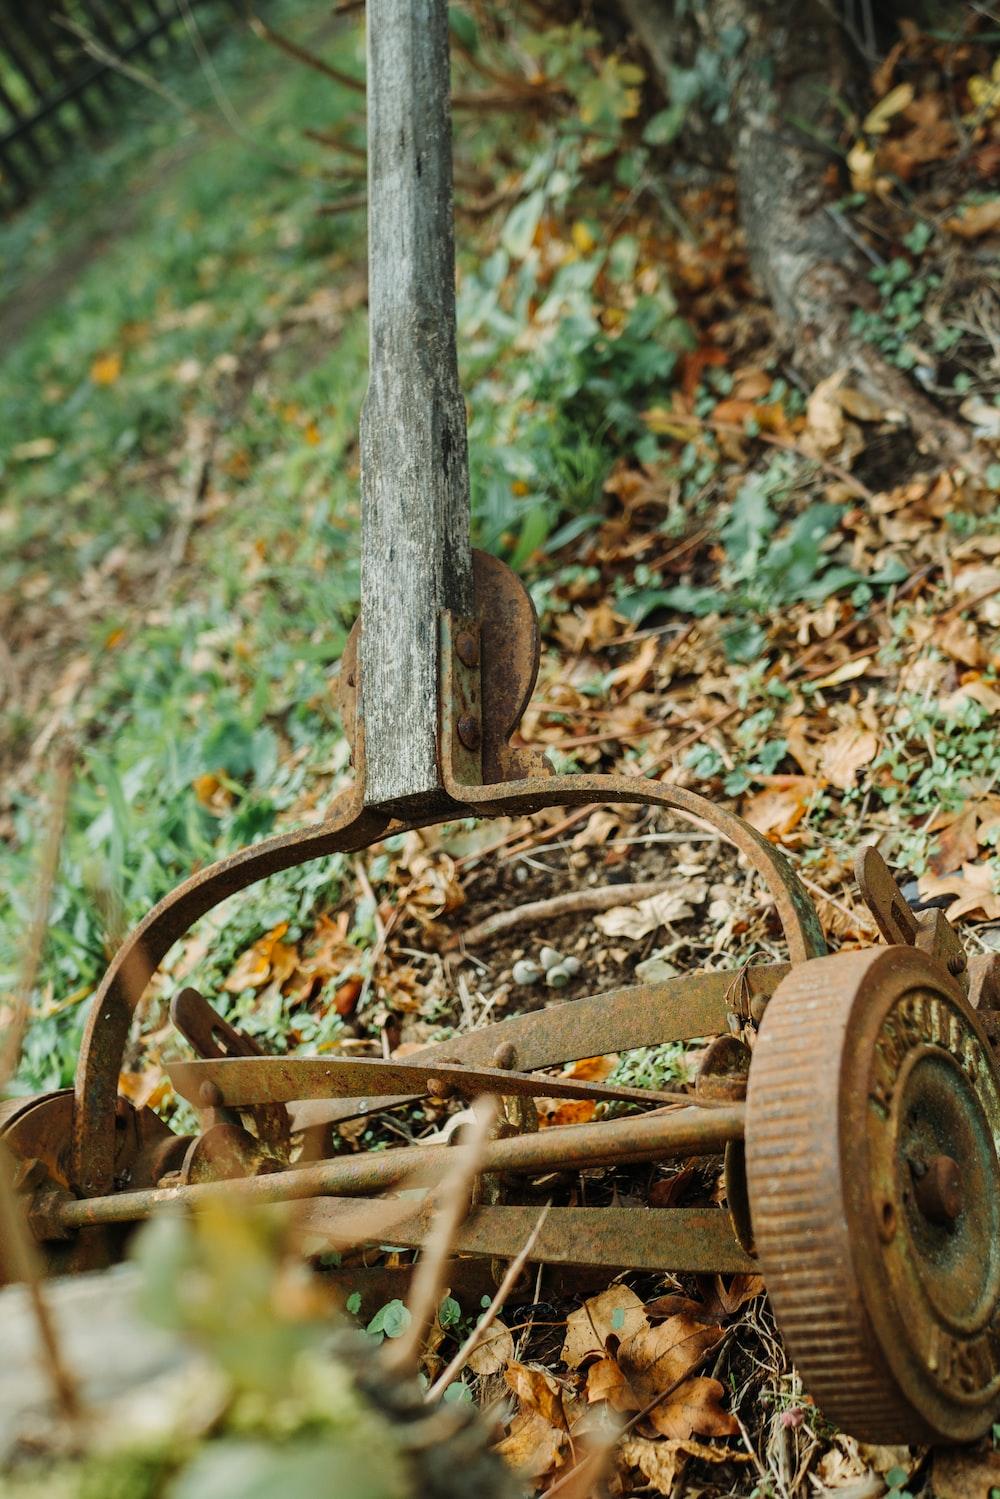 brown metal reel mower close-up photography